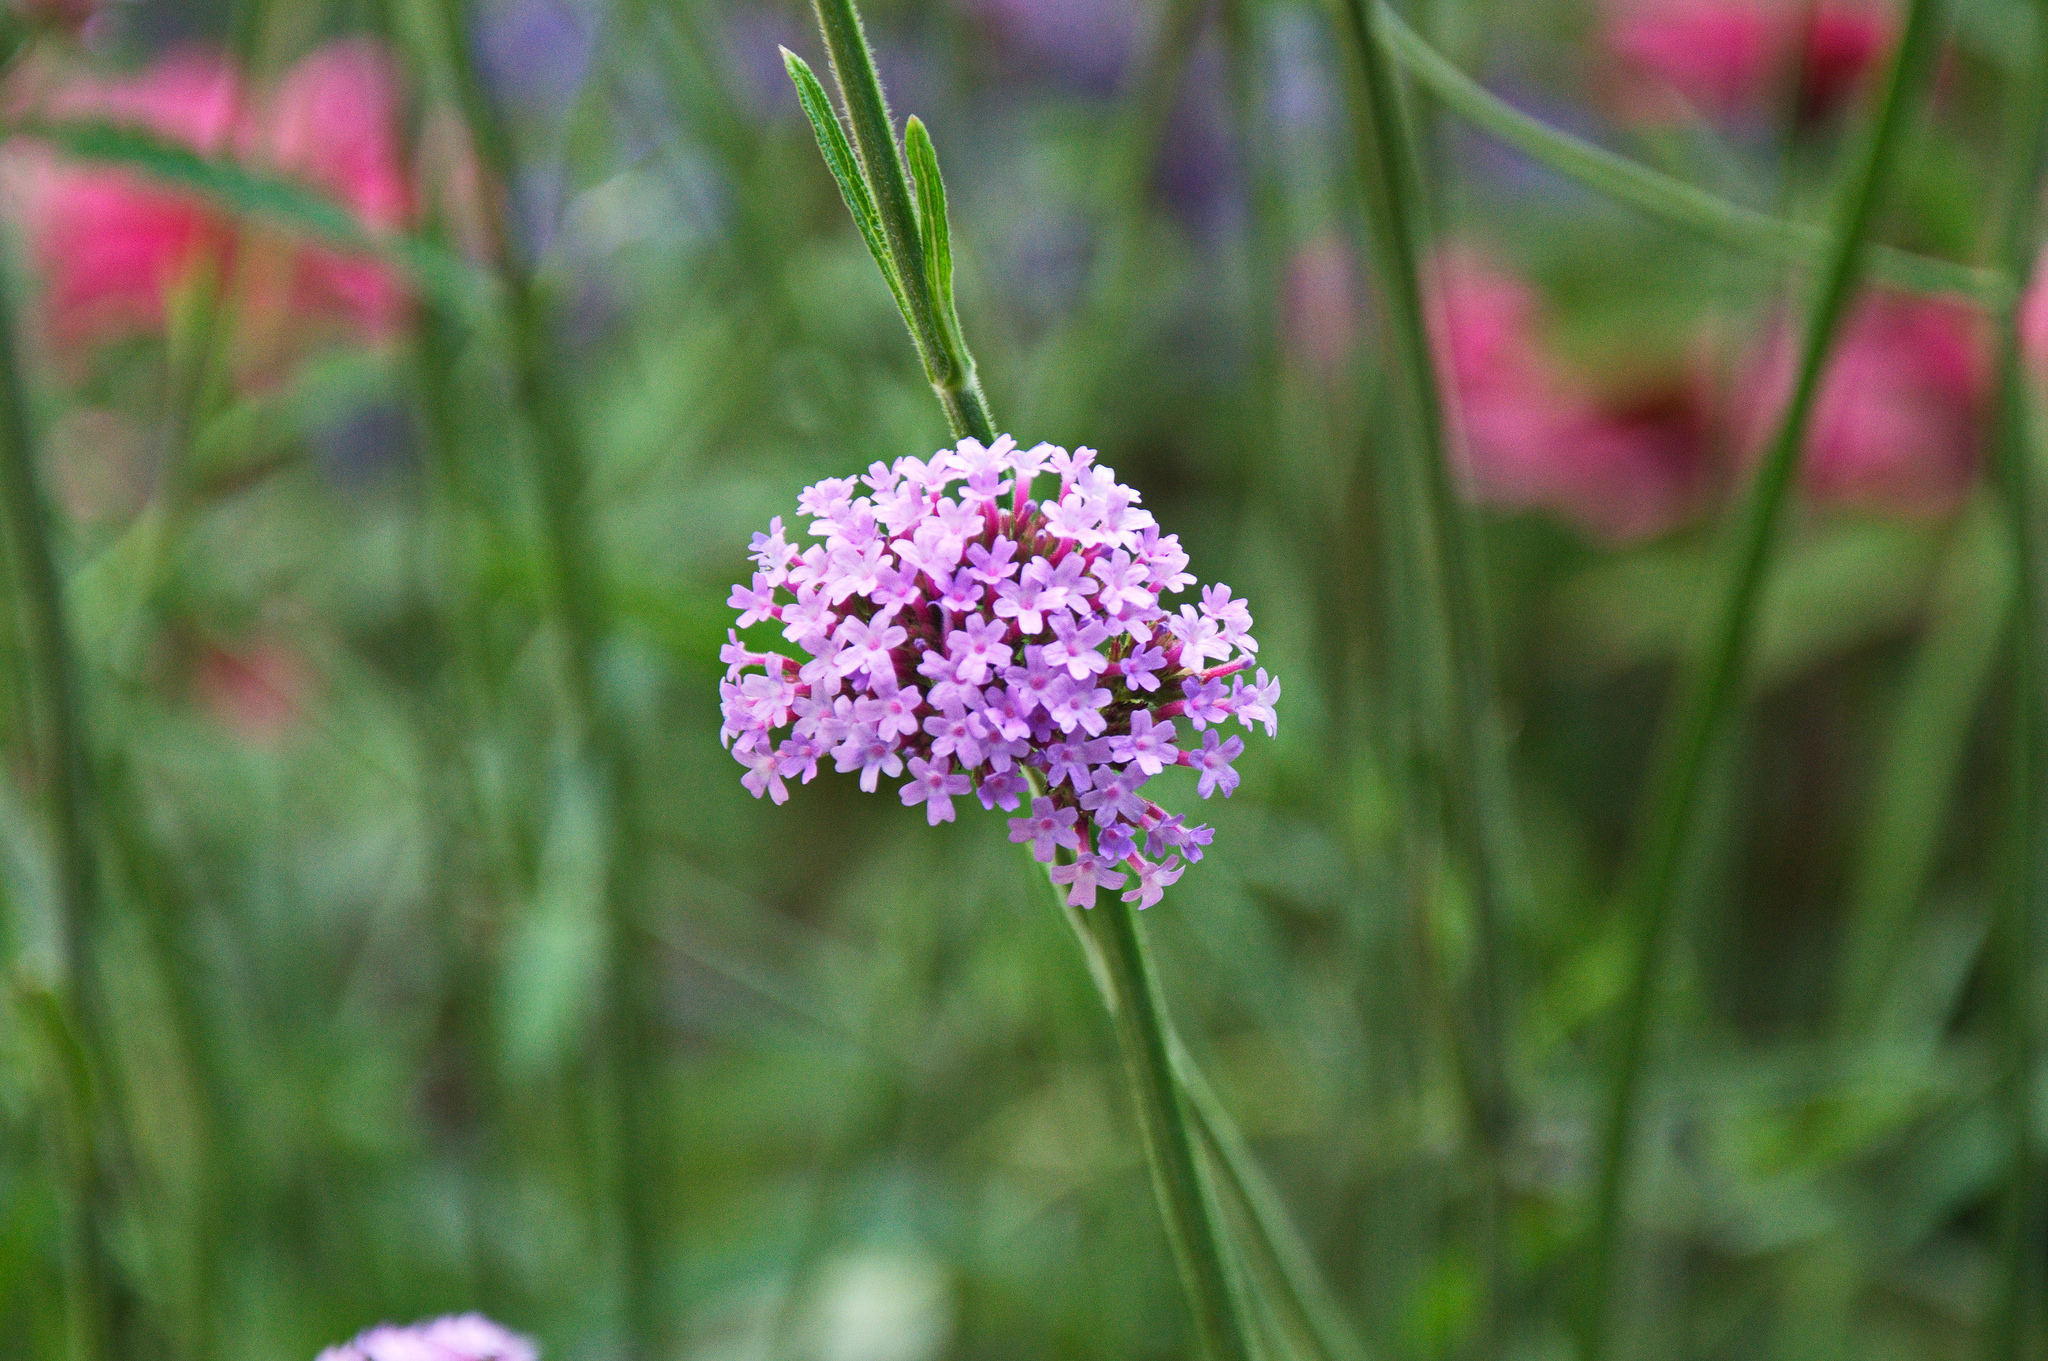 Verveine de buenos aires planter et cultiver ooreka - Planter de la verveine ...